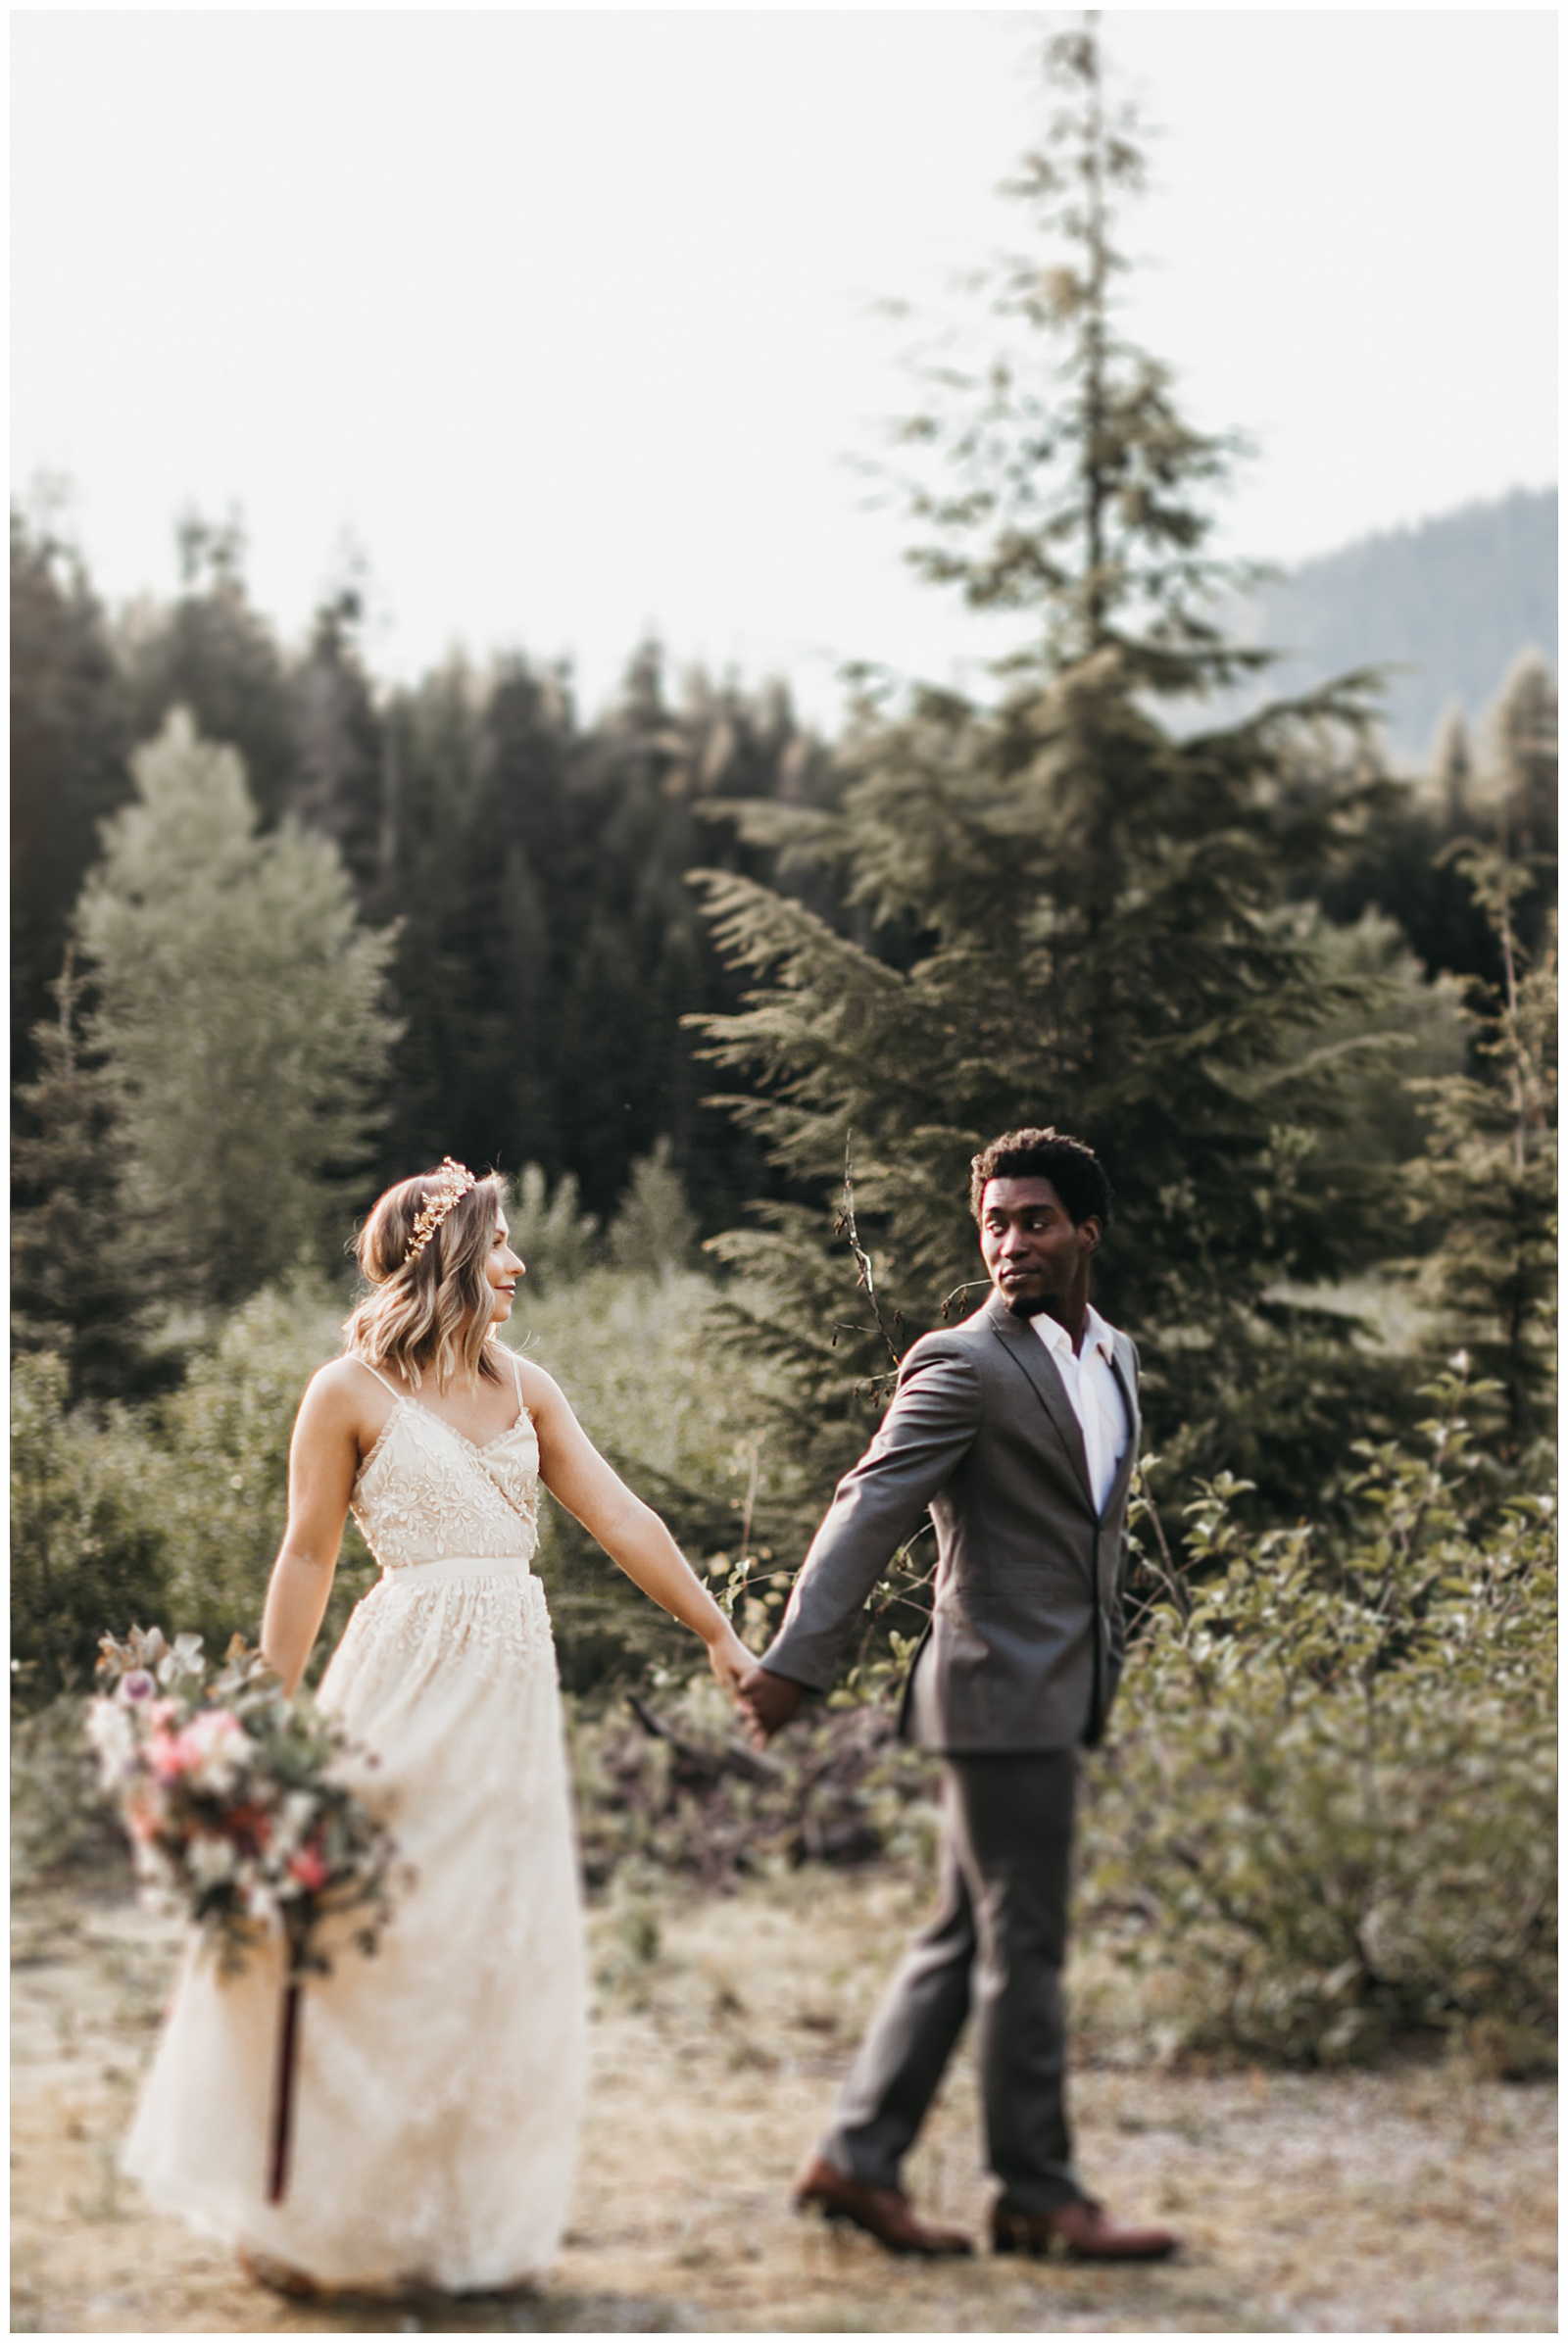 seattle-wedding-photographer-seattle-elopement-photographer-anniezav_0002.jpg